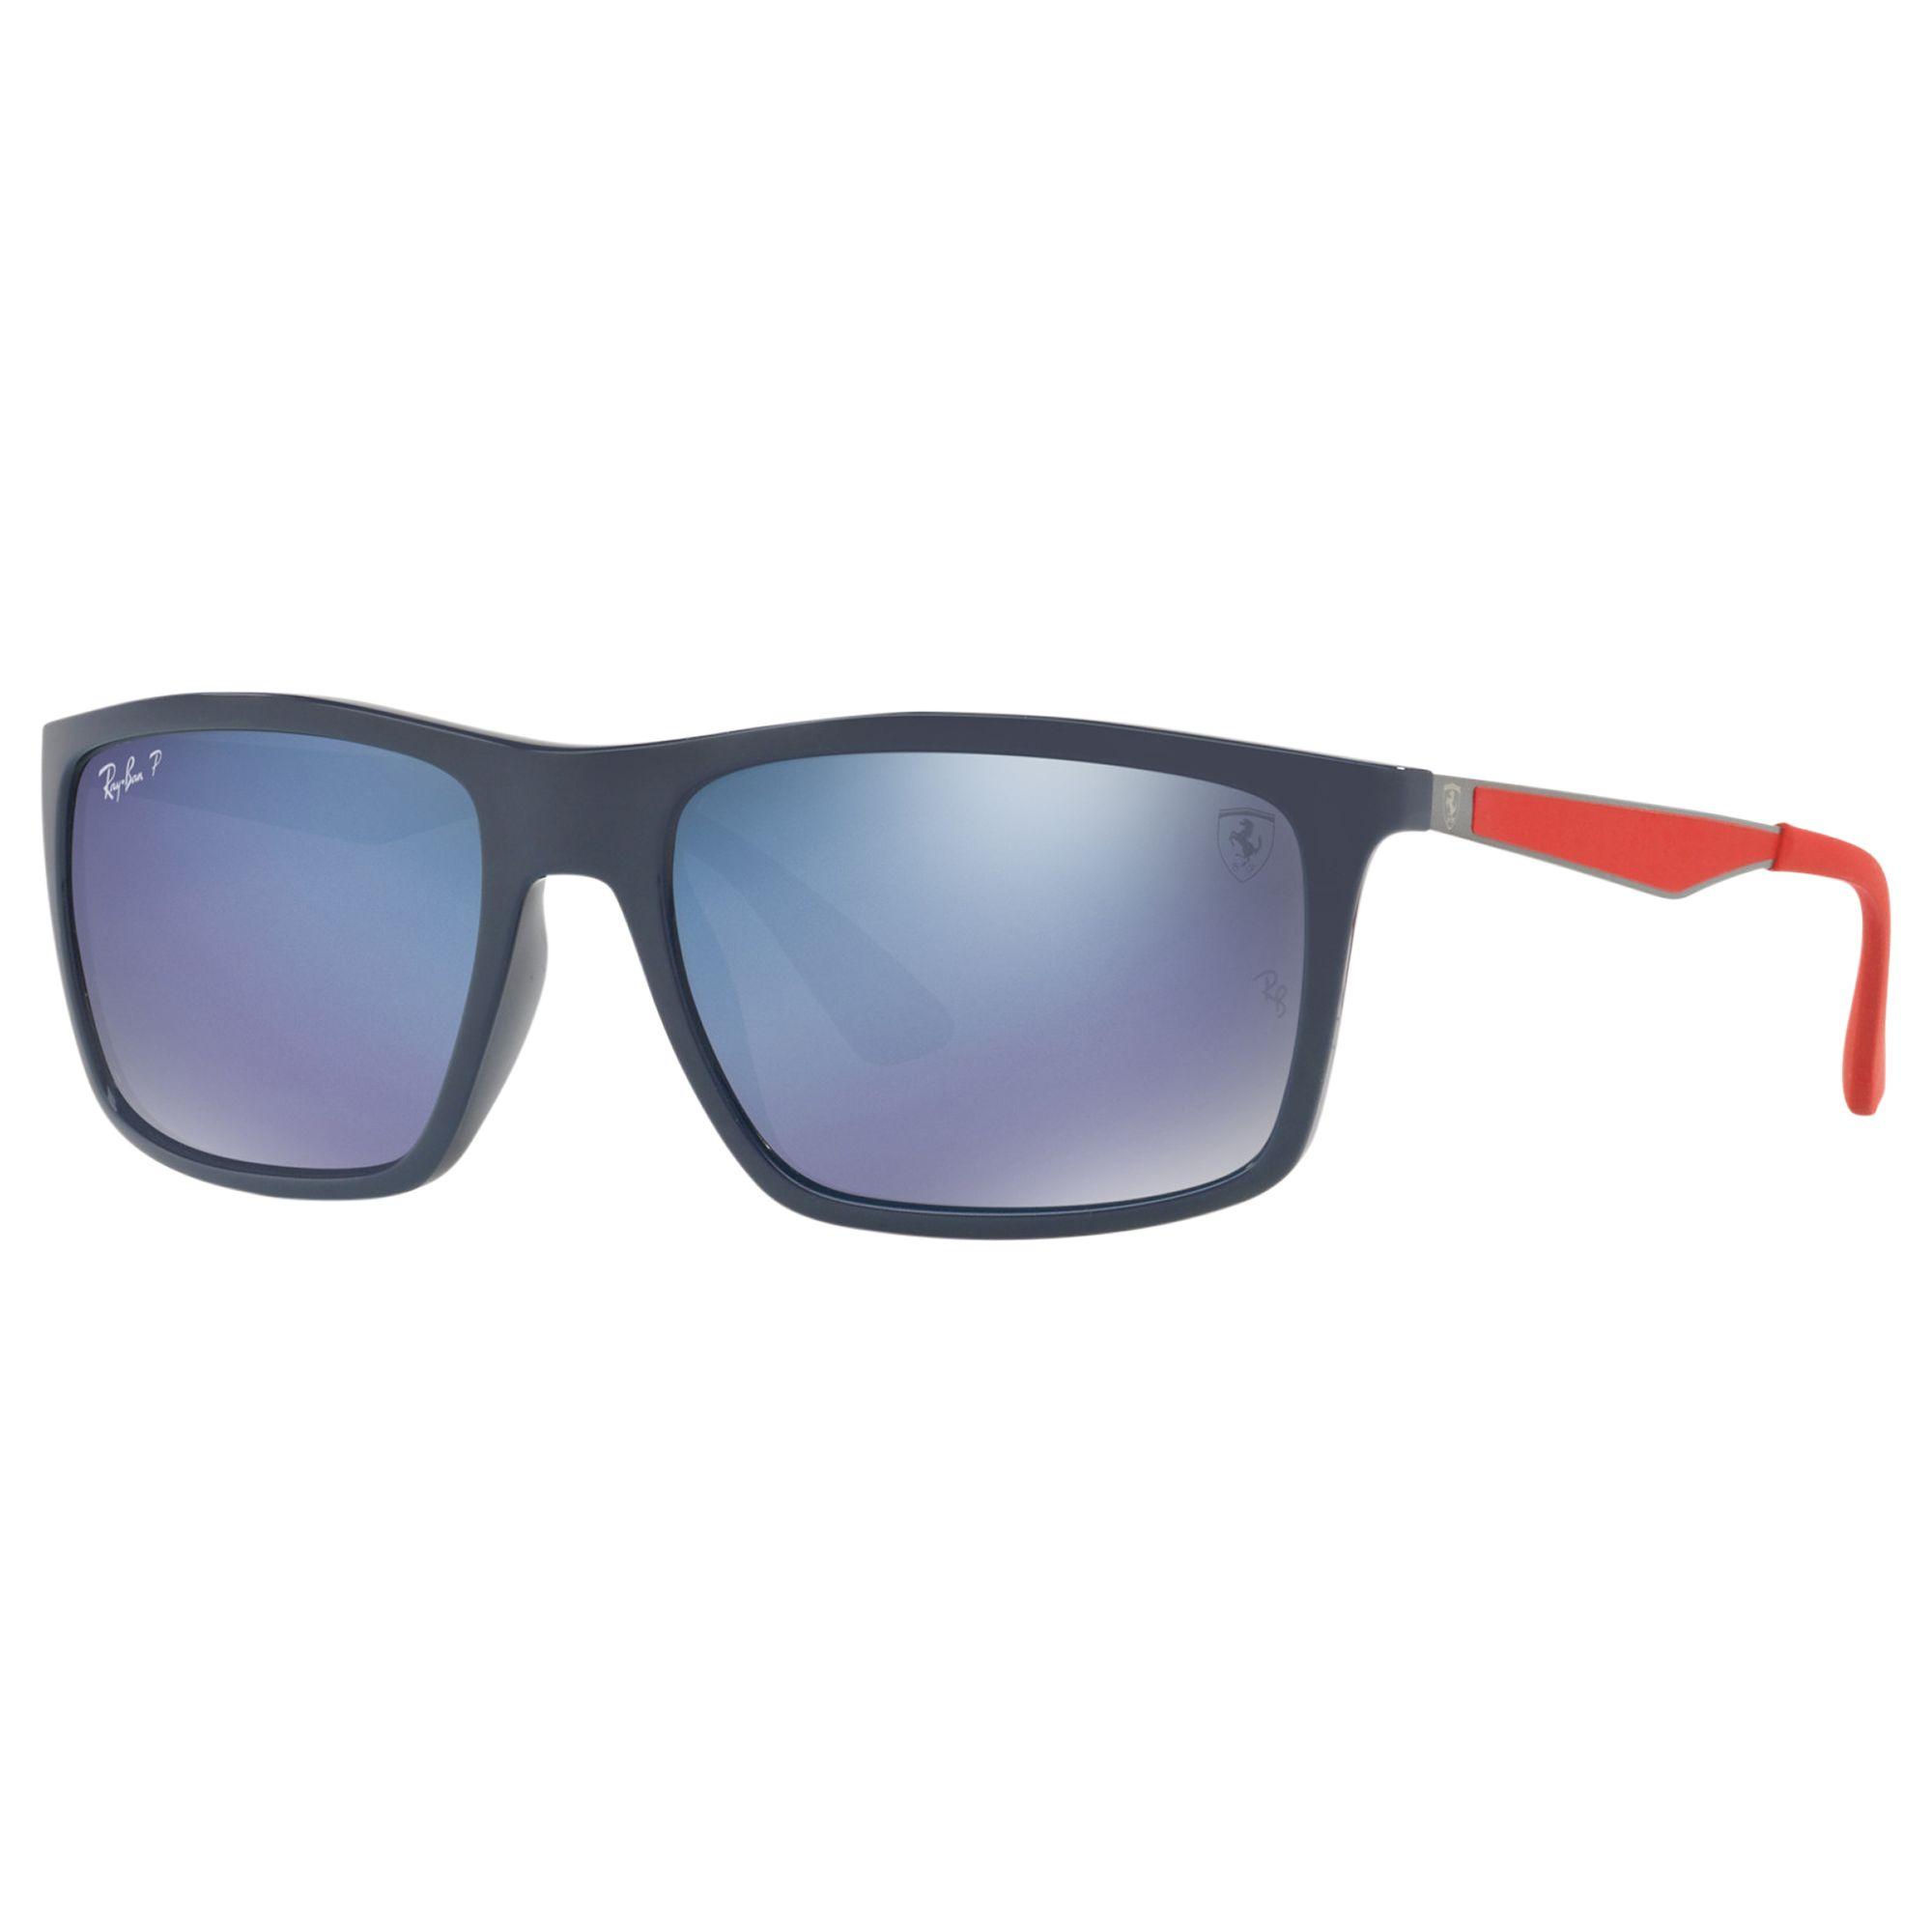 bf59266b99 Ray-Ban RB4228 Men s Polarised Rectangular Sunglasses